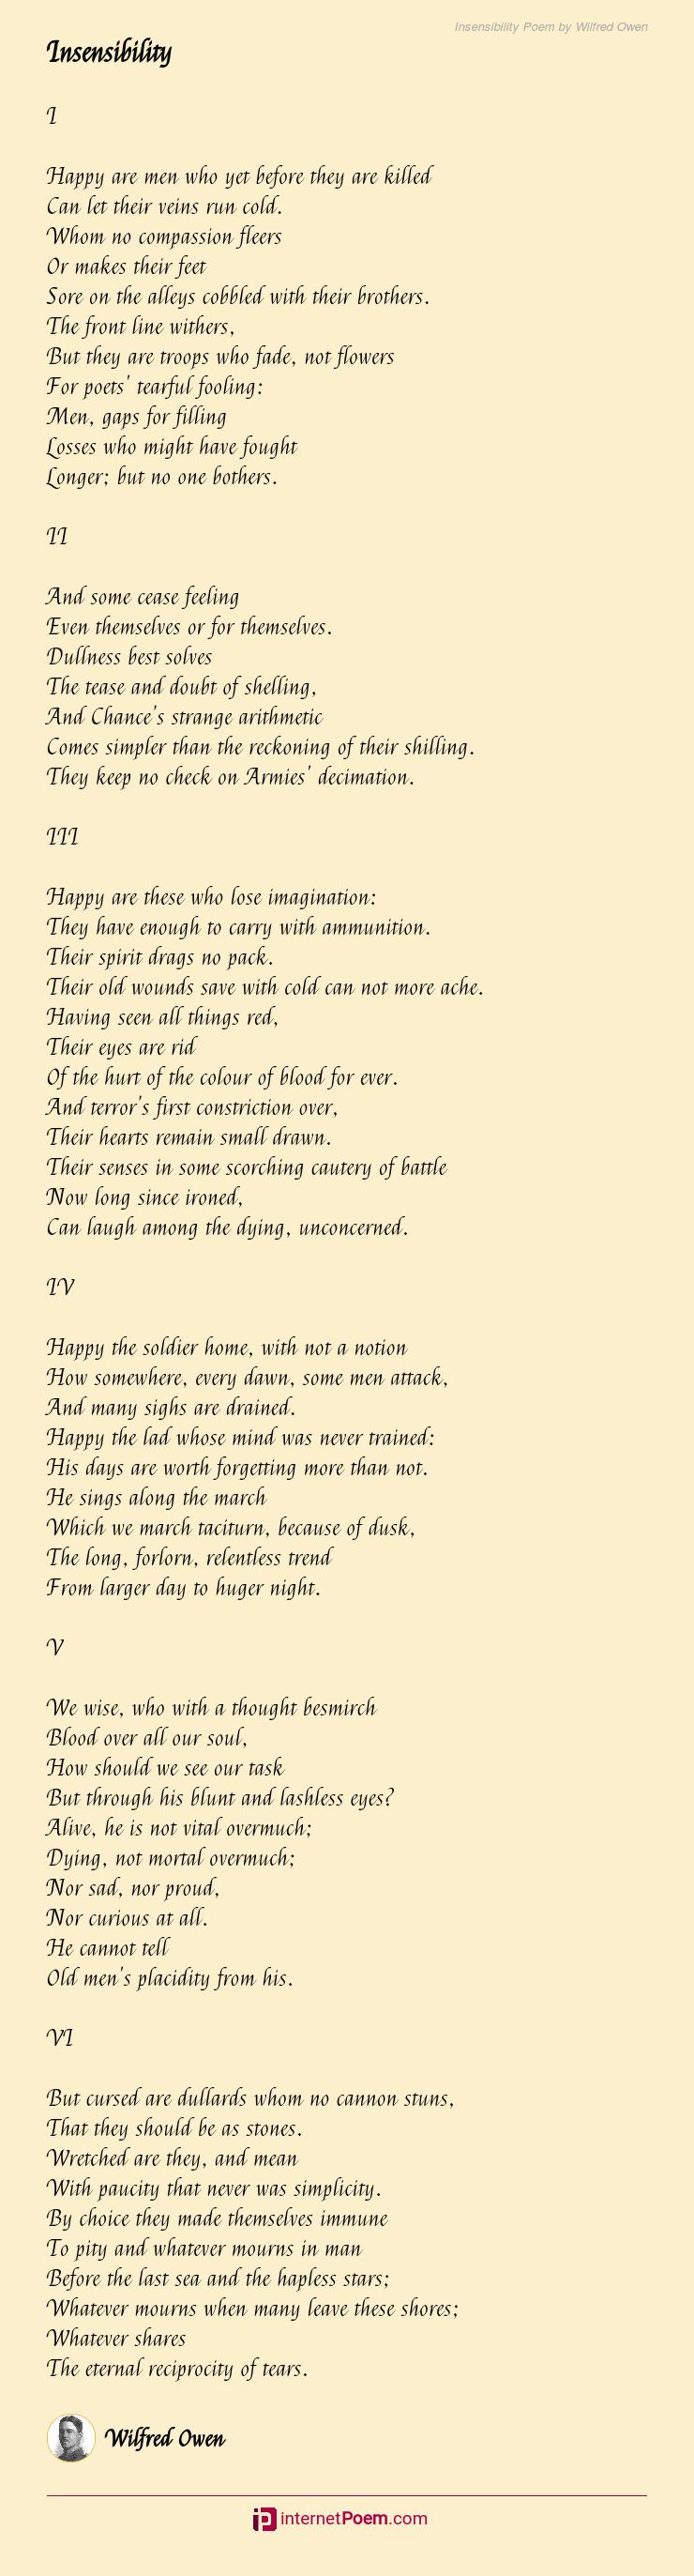 Insensibility Poem By Wilfred Owen